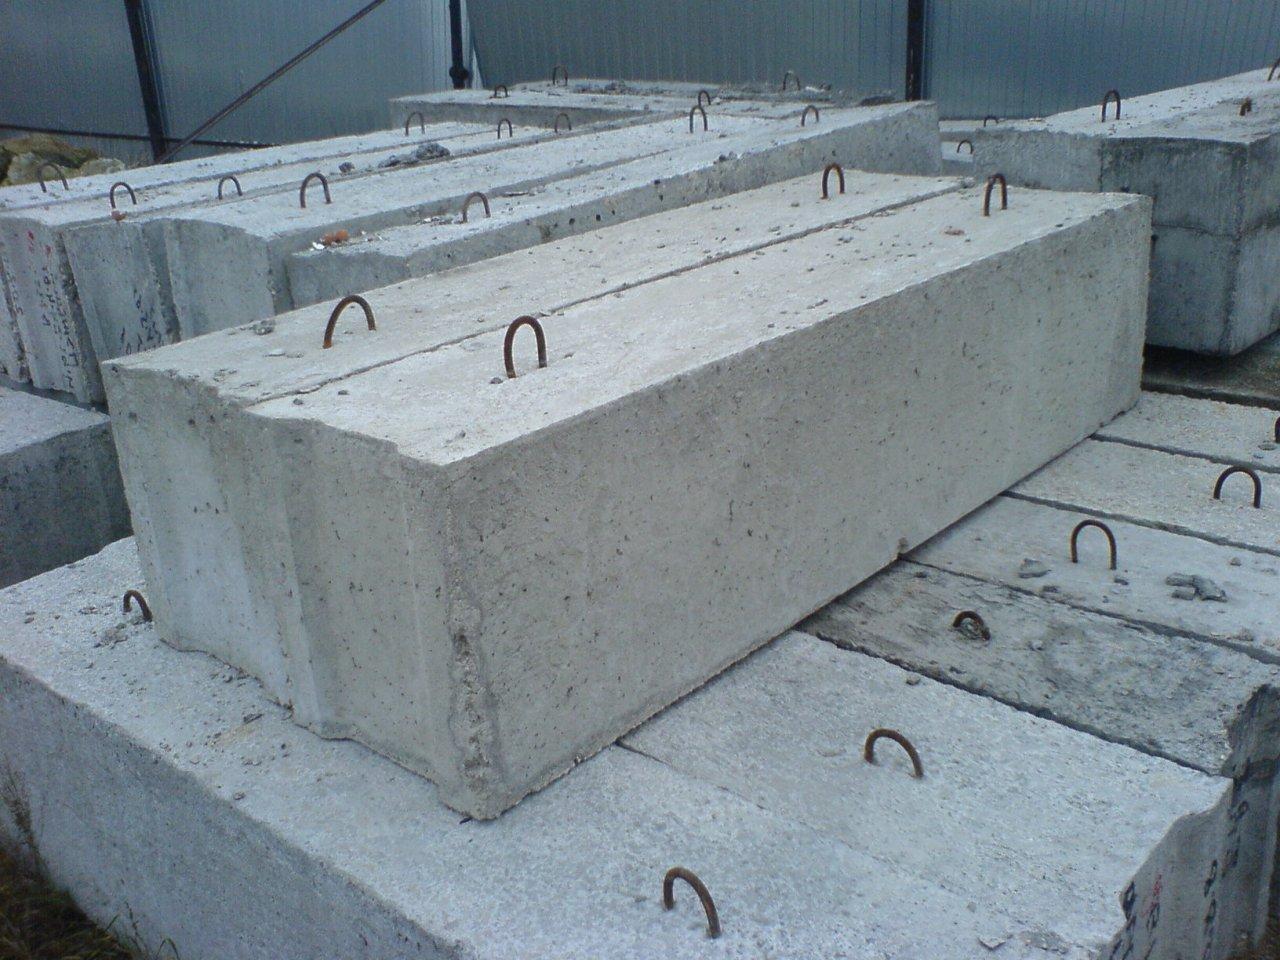 http://betonzone.com/wp-content/uploads/2015/01/betonnye-bloki-dlja-fundamenta.jpg